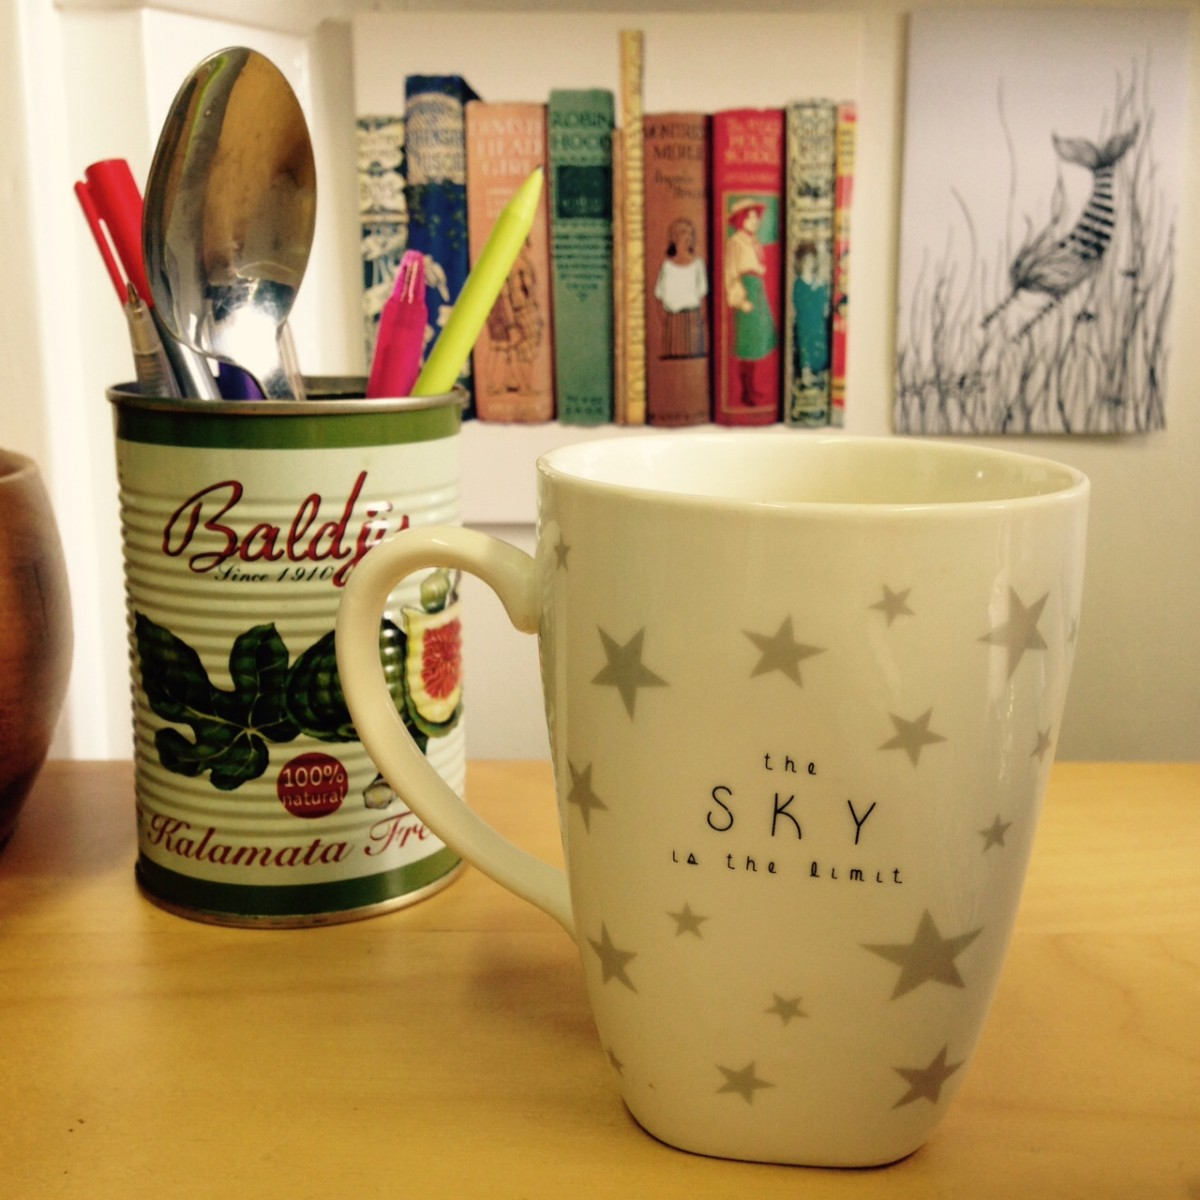 blogger work space